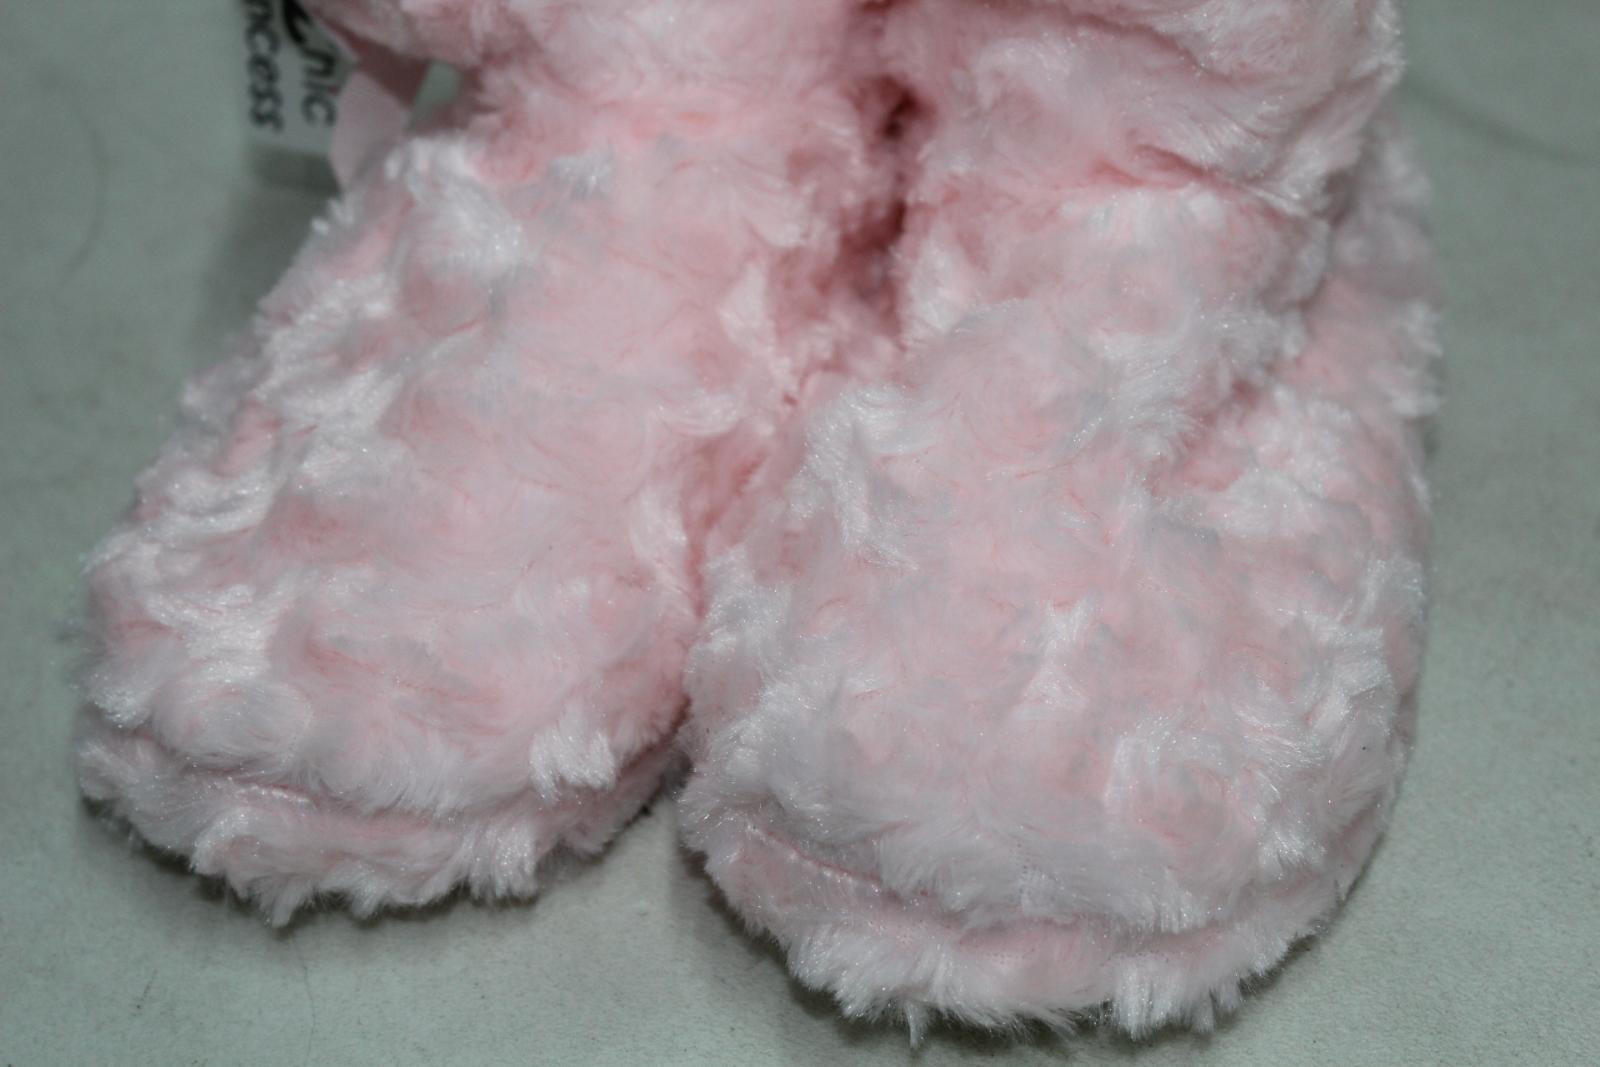 CHIC PRINCESS Girls Pink Fluffy Winter Warm Slipper Shoe Boots UK5 EU38 BNWT 10